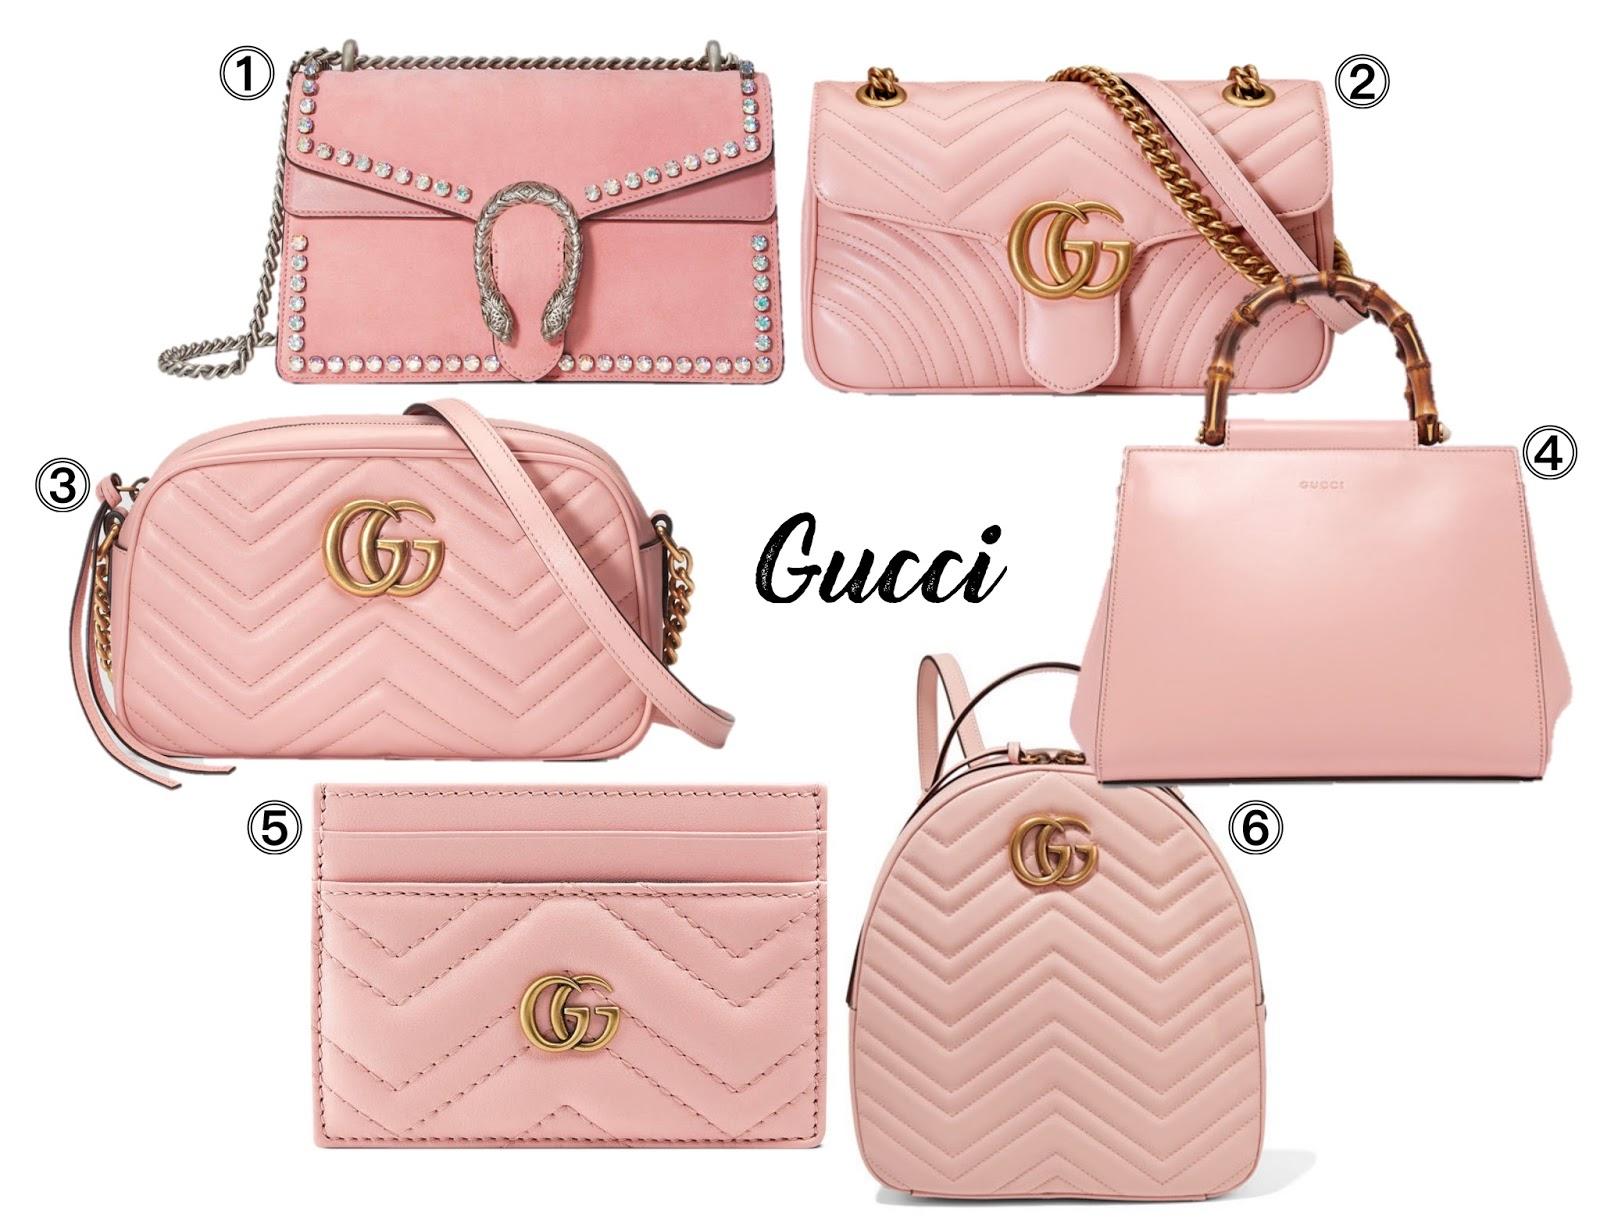 Pink Small Marmont Bag Gucci brWErmPc6